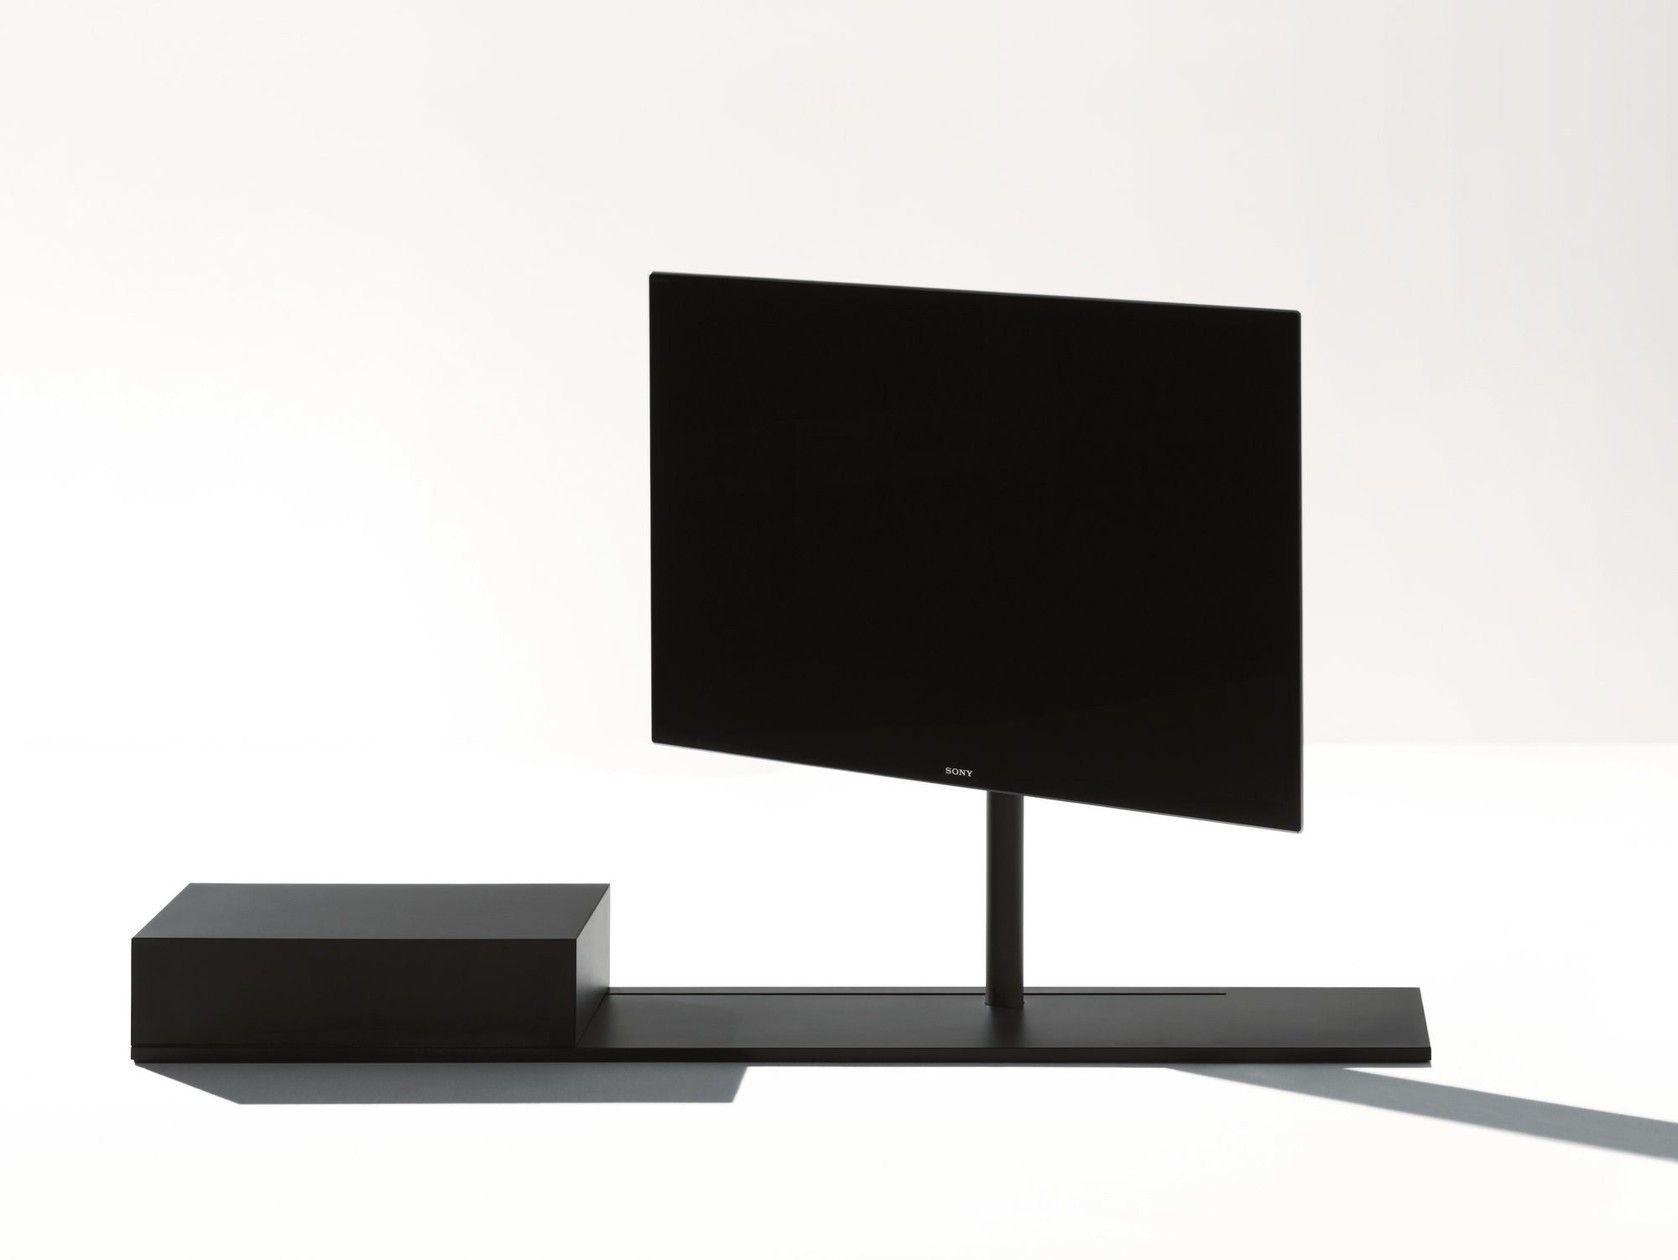 Wissmann Raumobjekte Porta Tv Girevole.Best Of Meuble Tele Pivotant Funiture